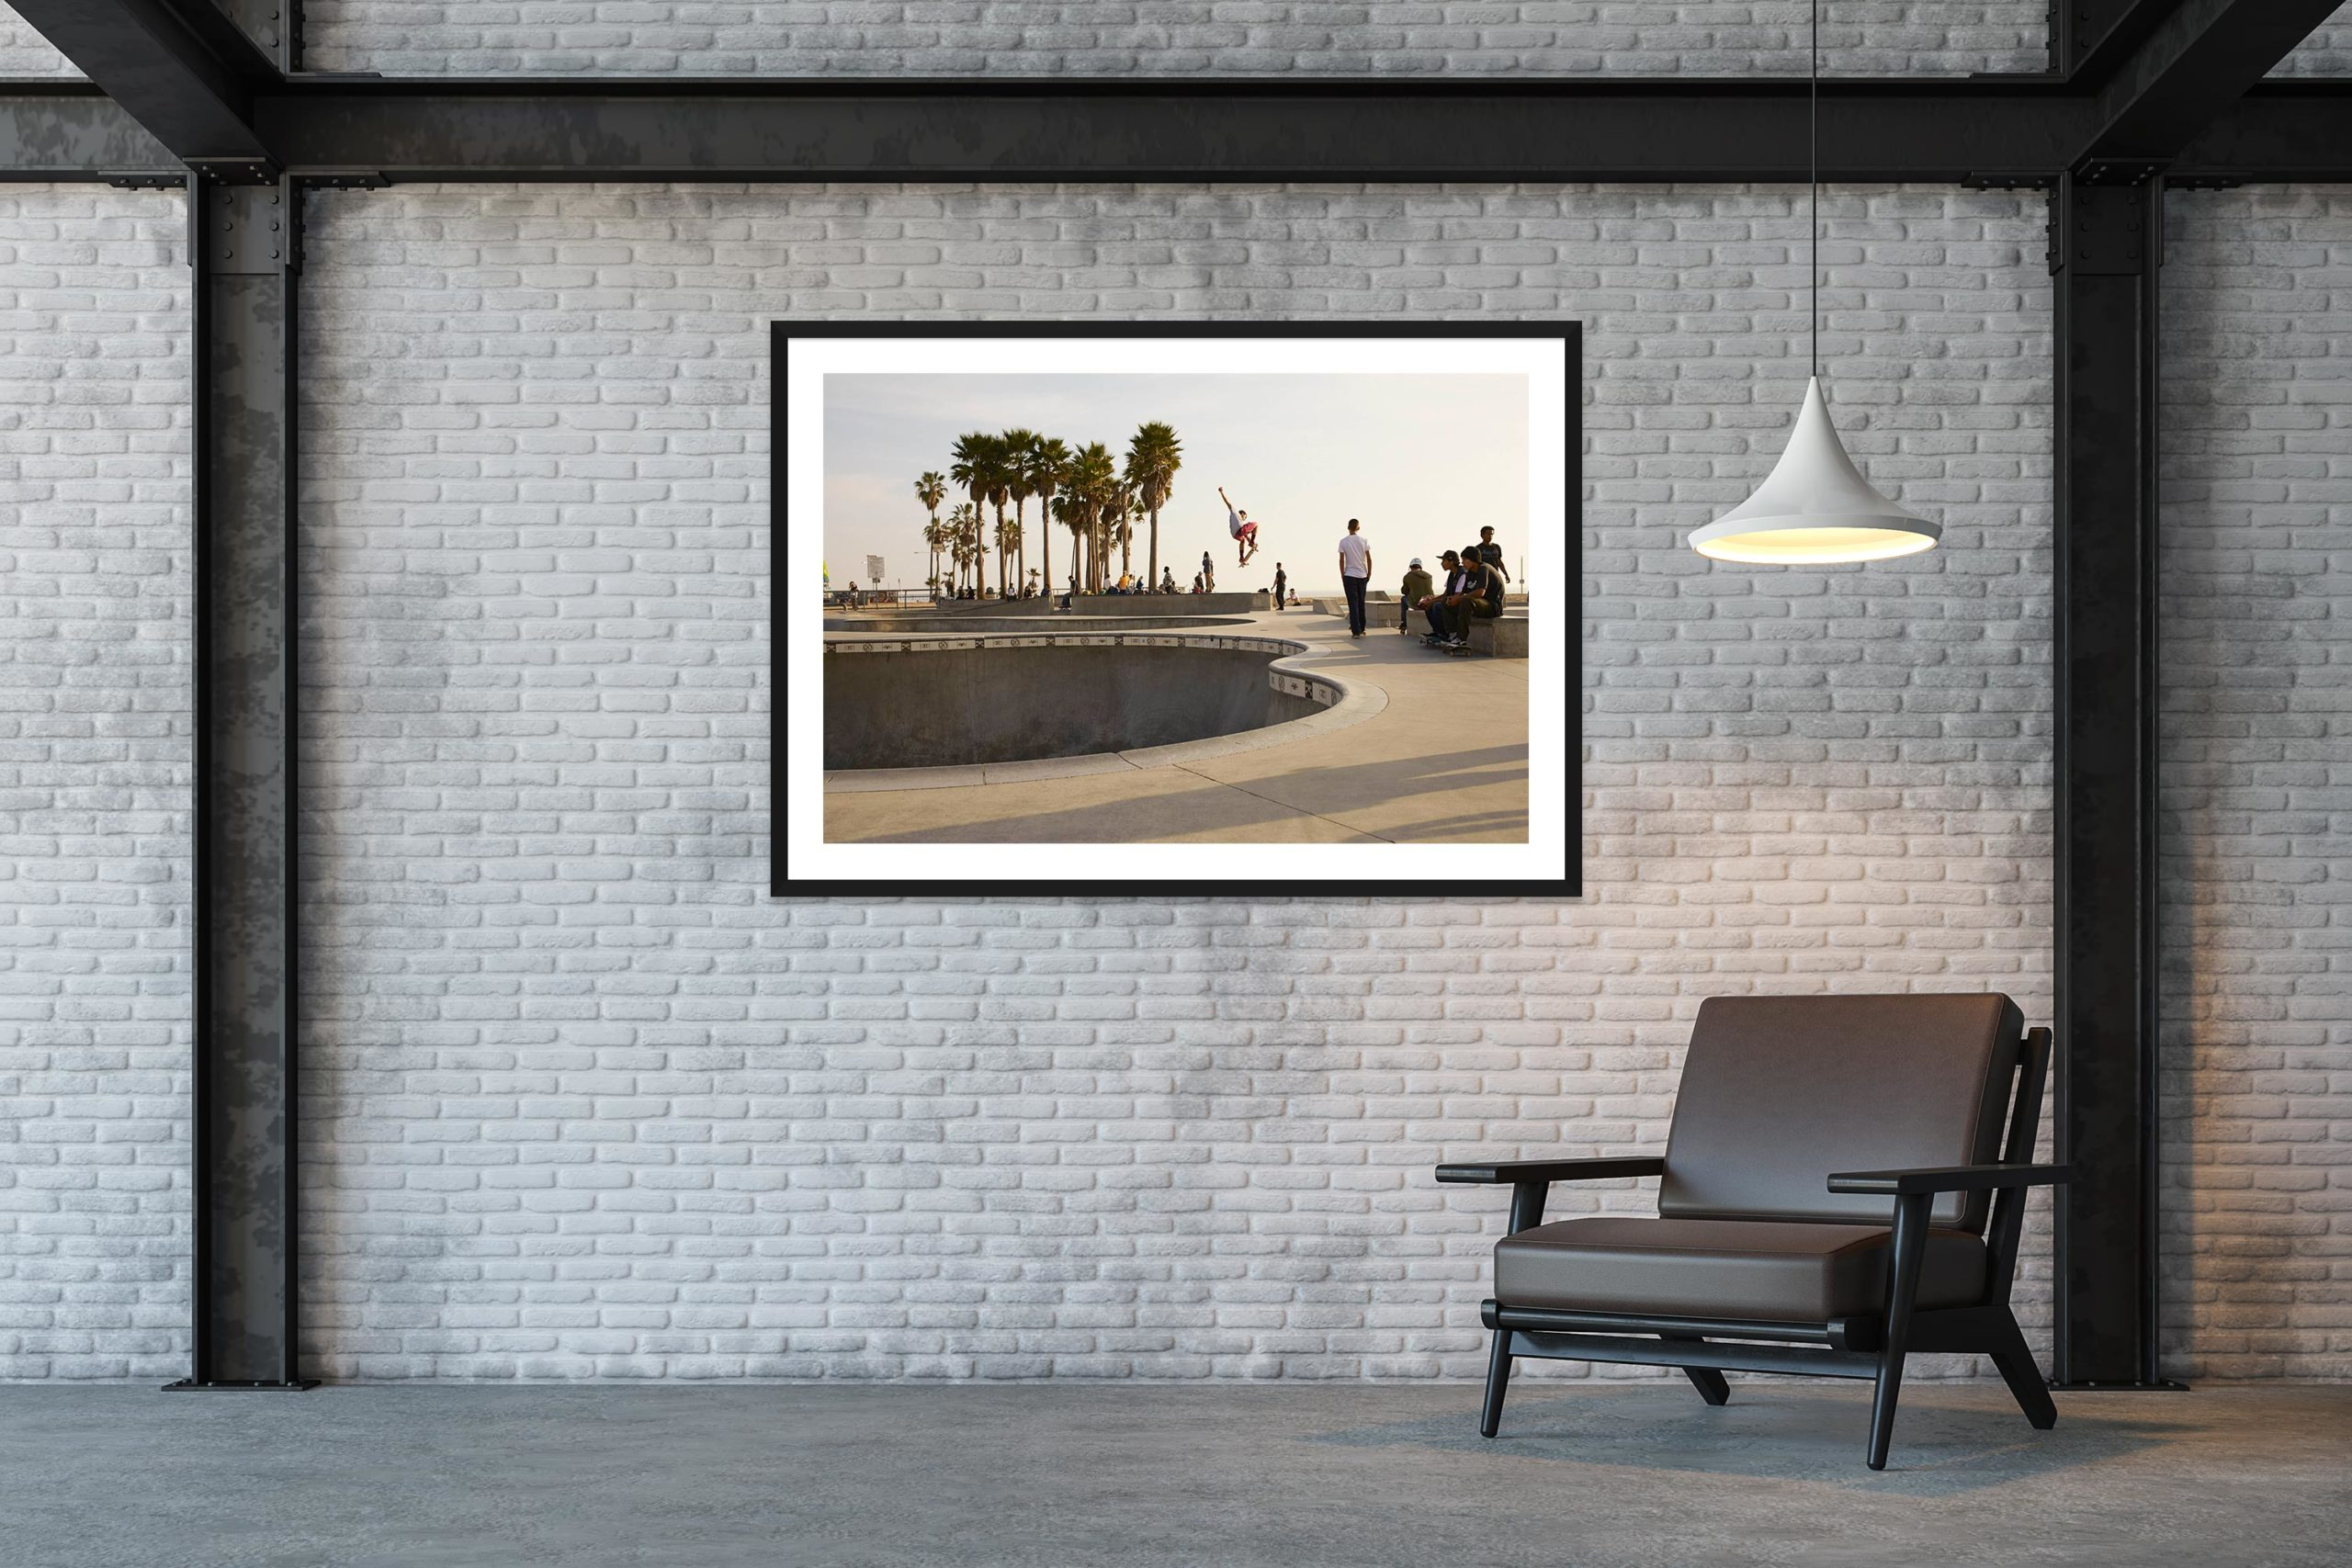 Air - Black Frame - Skate Park, Venice Beach Collection - Fine Art Photography by Toby Dixon